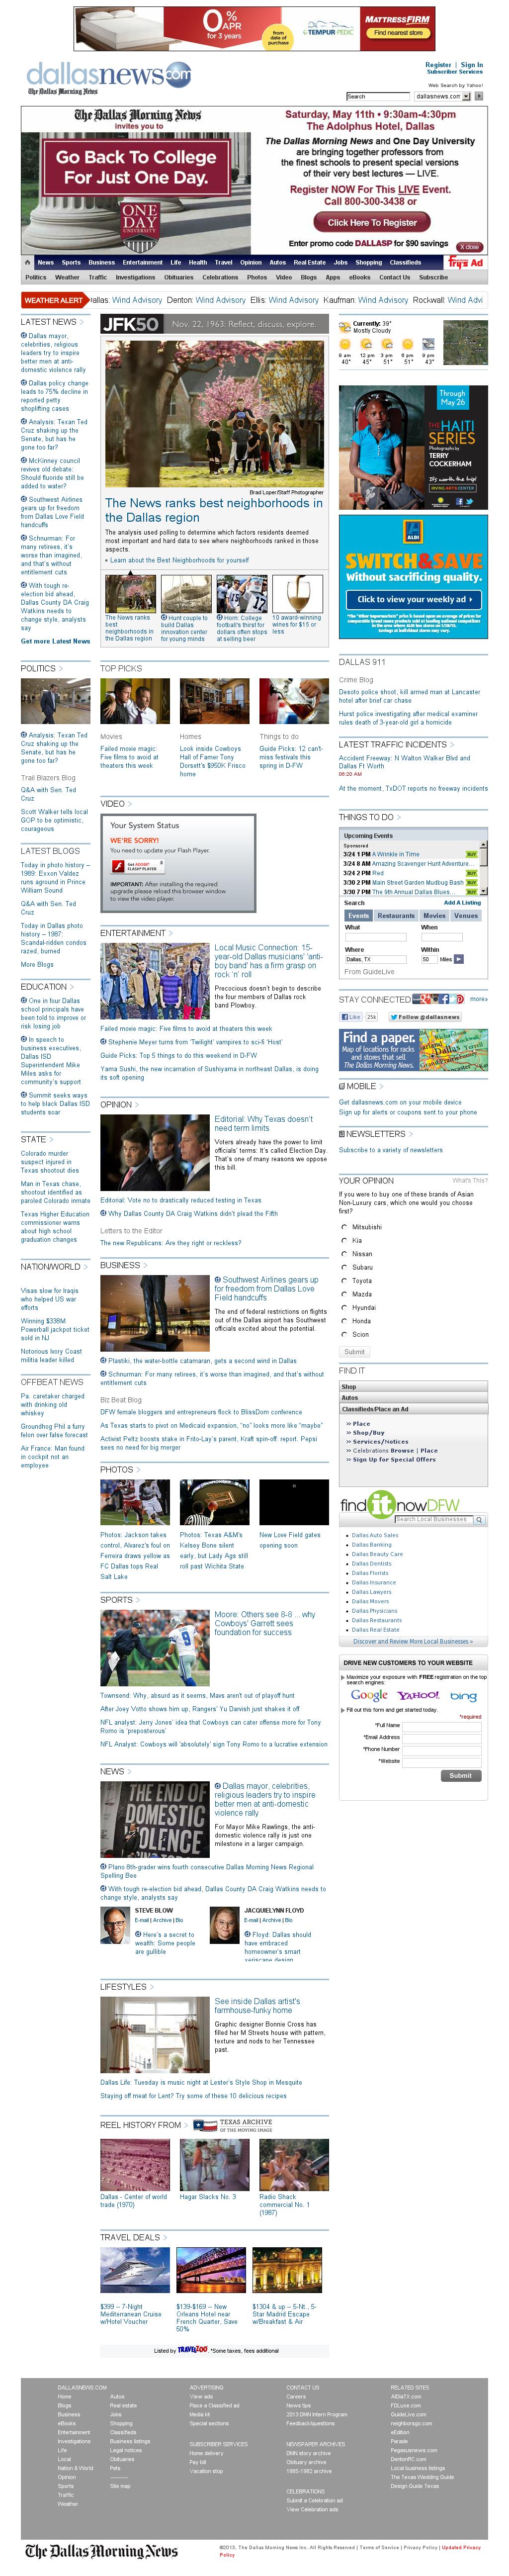 dallasnews.com at Sunday March 24, 2013, 1:09 p.m. UTC